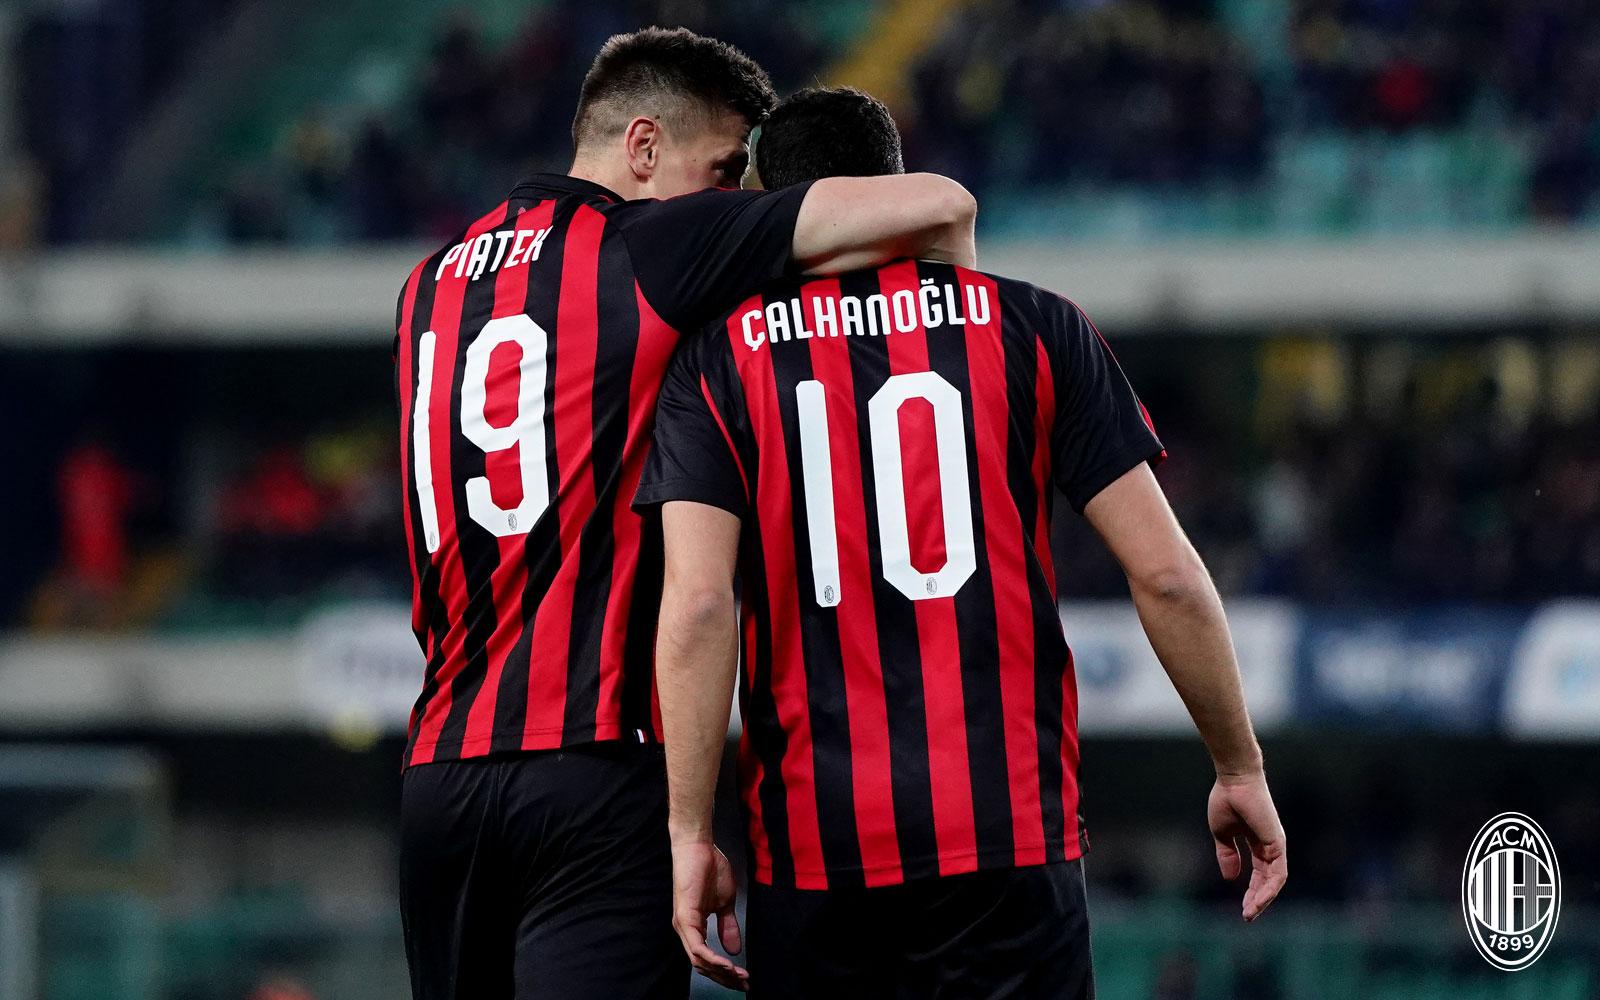 Krzysztof Piątek and Hakan Çalhanoğlu celebrating during Chievo-Milan at Stadio Marc'Antonio Bentegodi on March 10, 2019. (@acmilan.com)